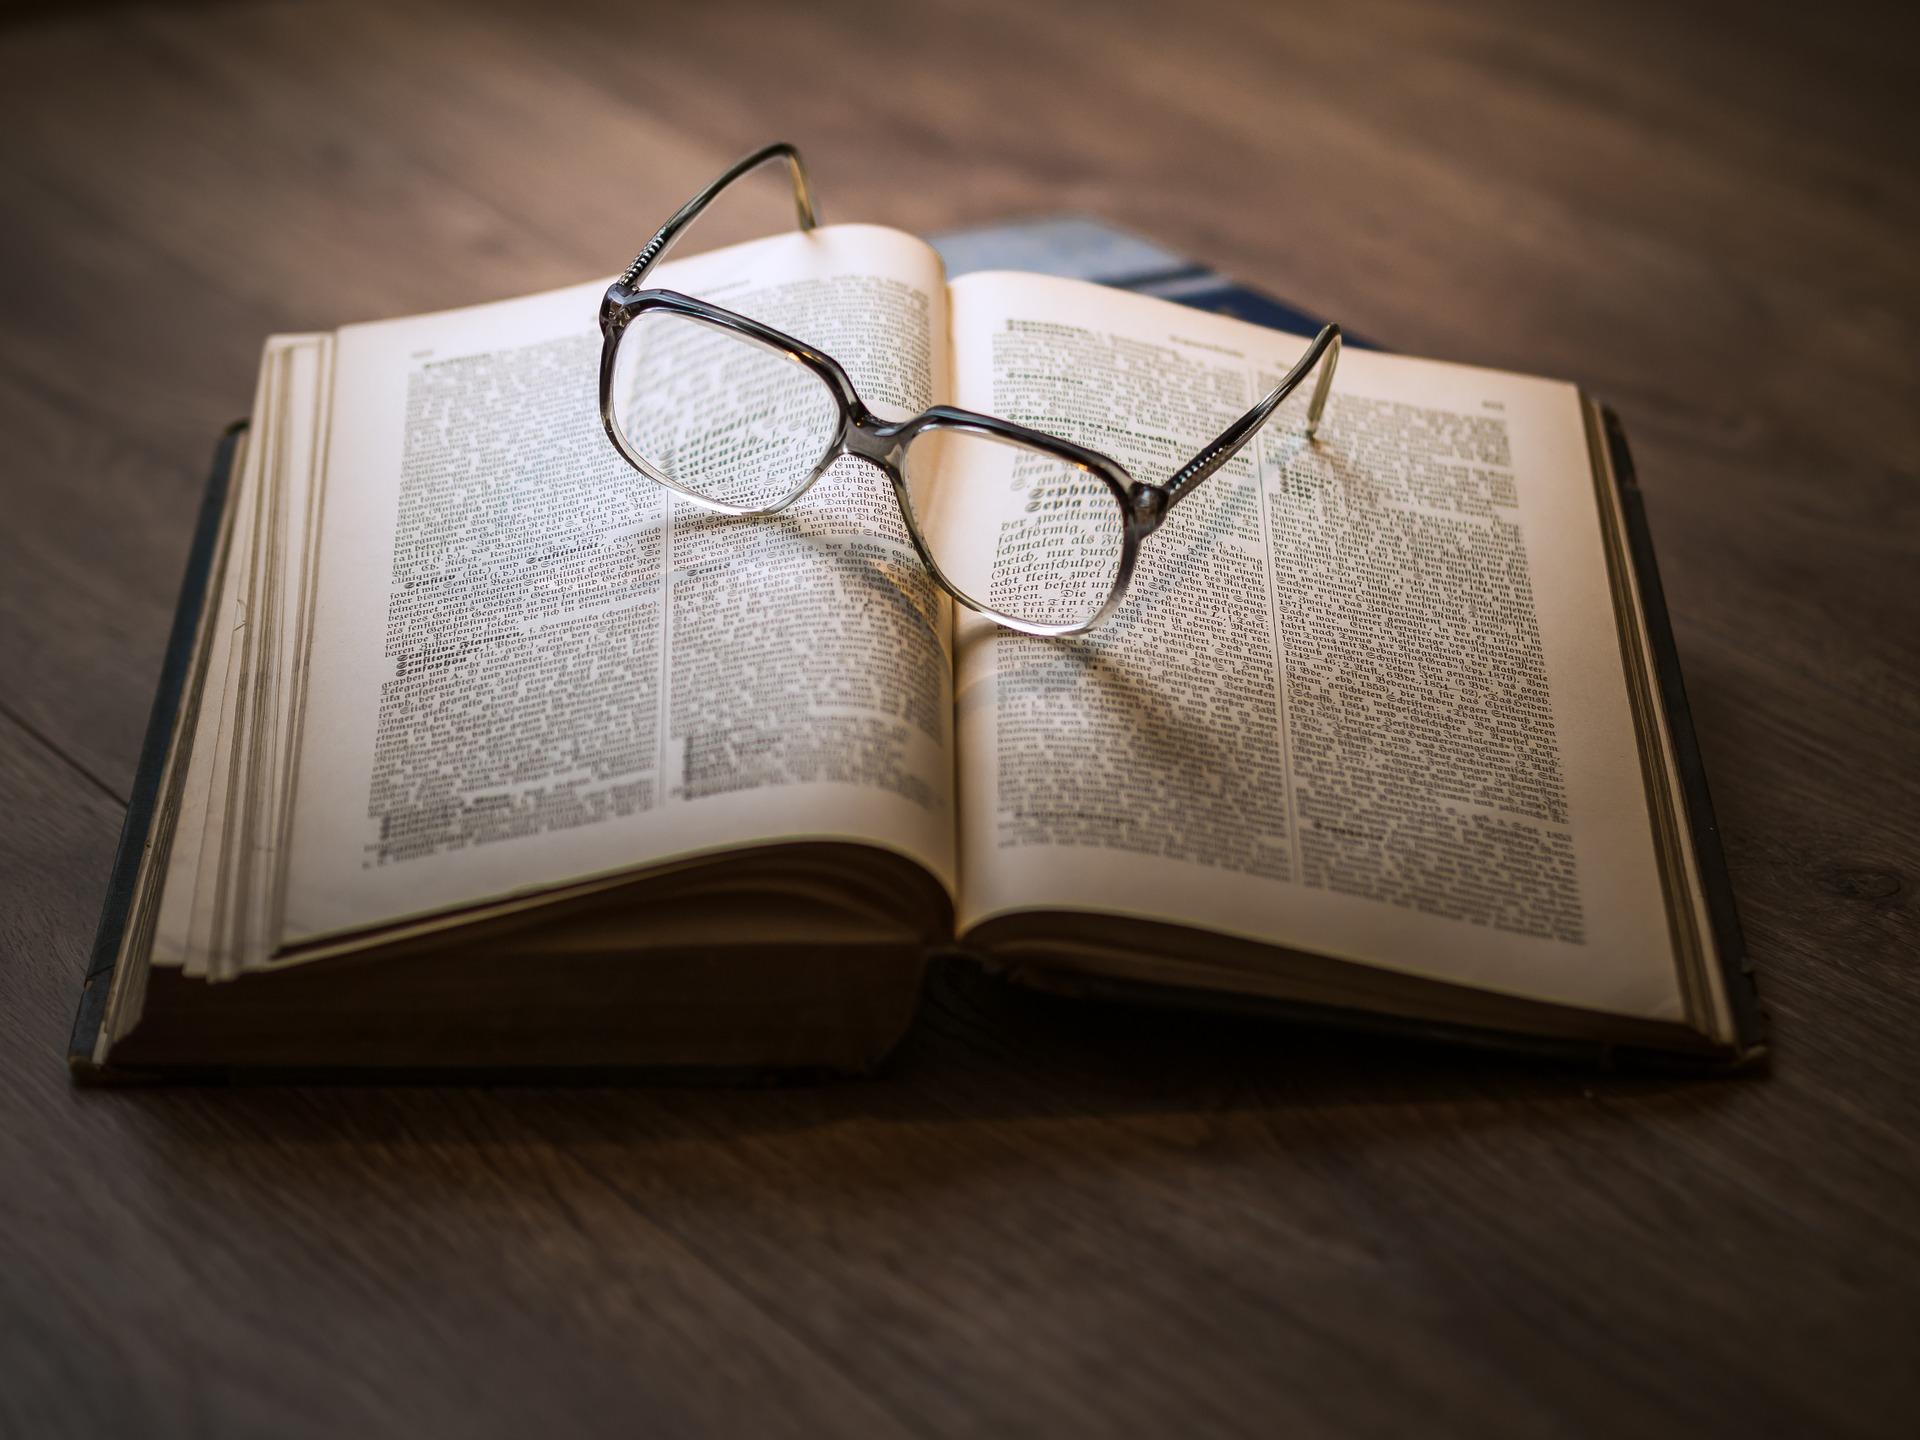 Goodreads Leserunde hat begonnen